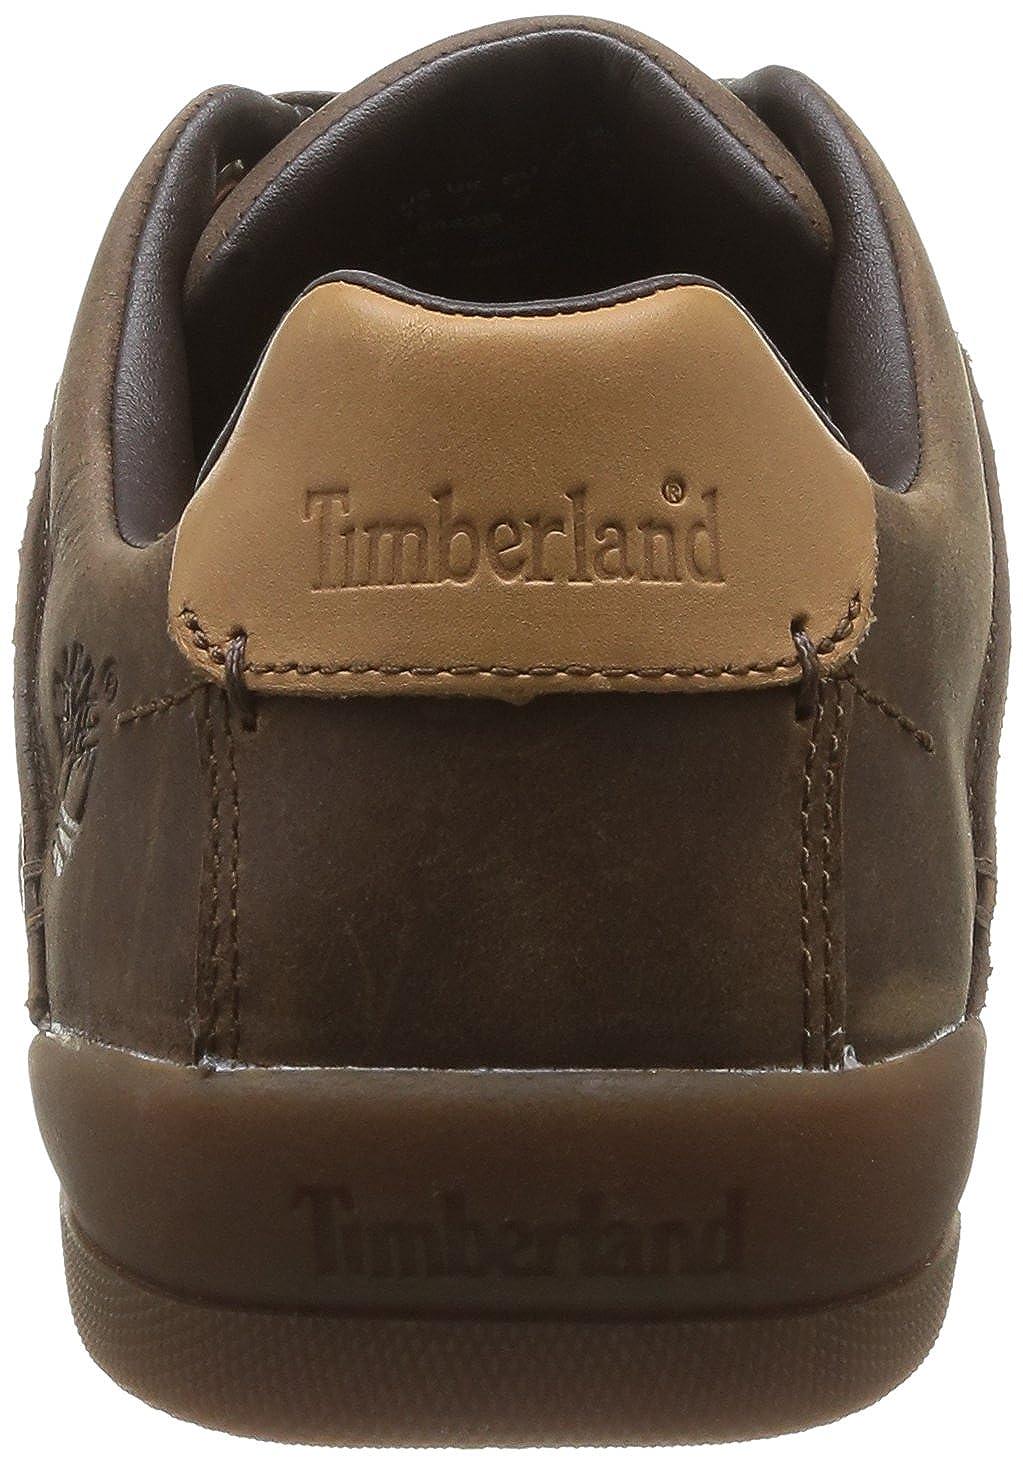 Timberland, Ekspltcp Bso, Sneaker,Uomo, Marrone (Braun